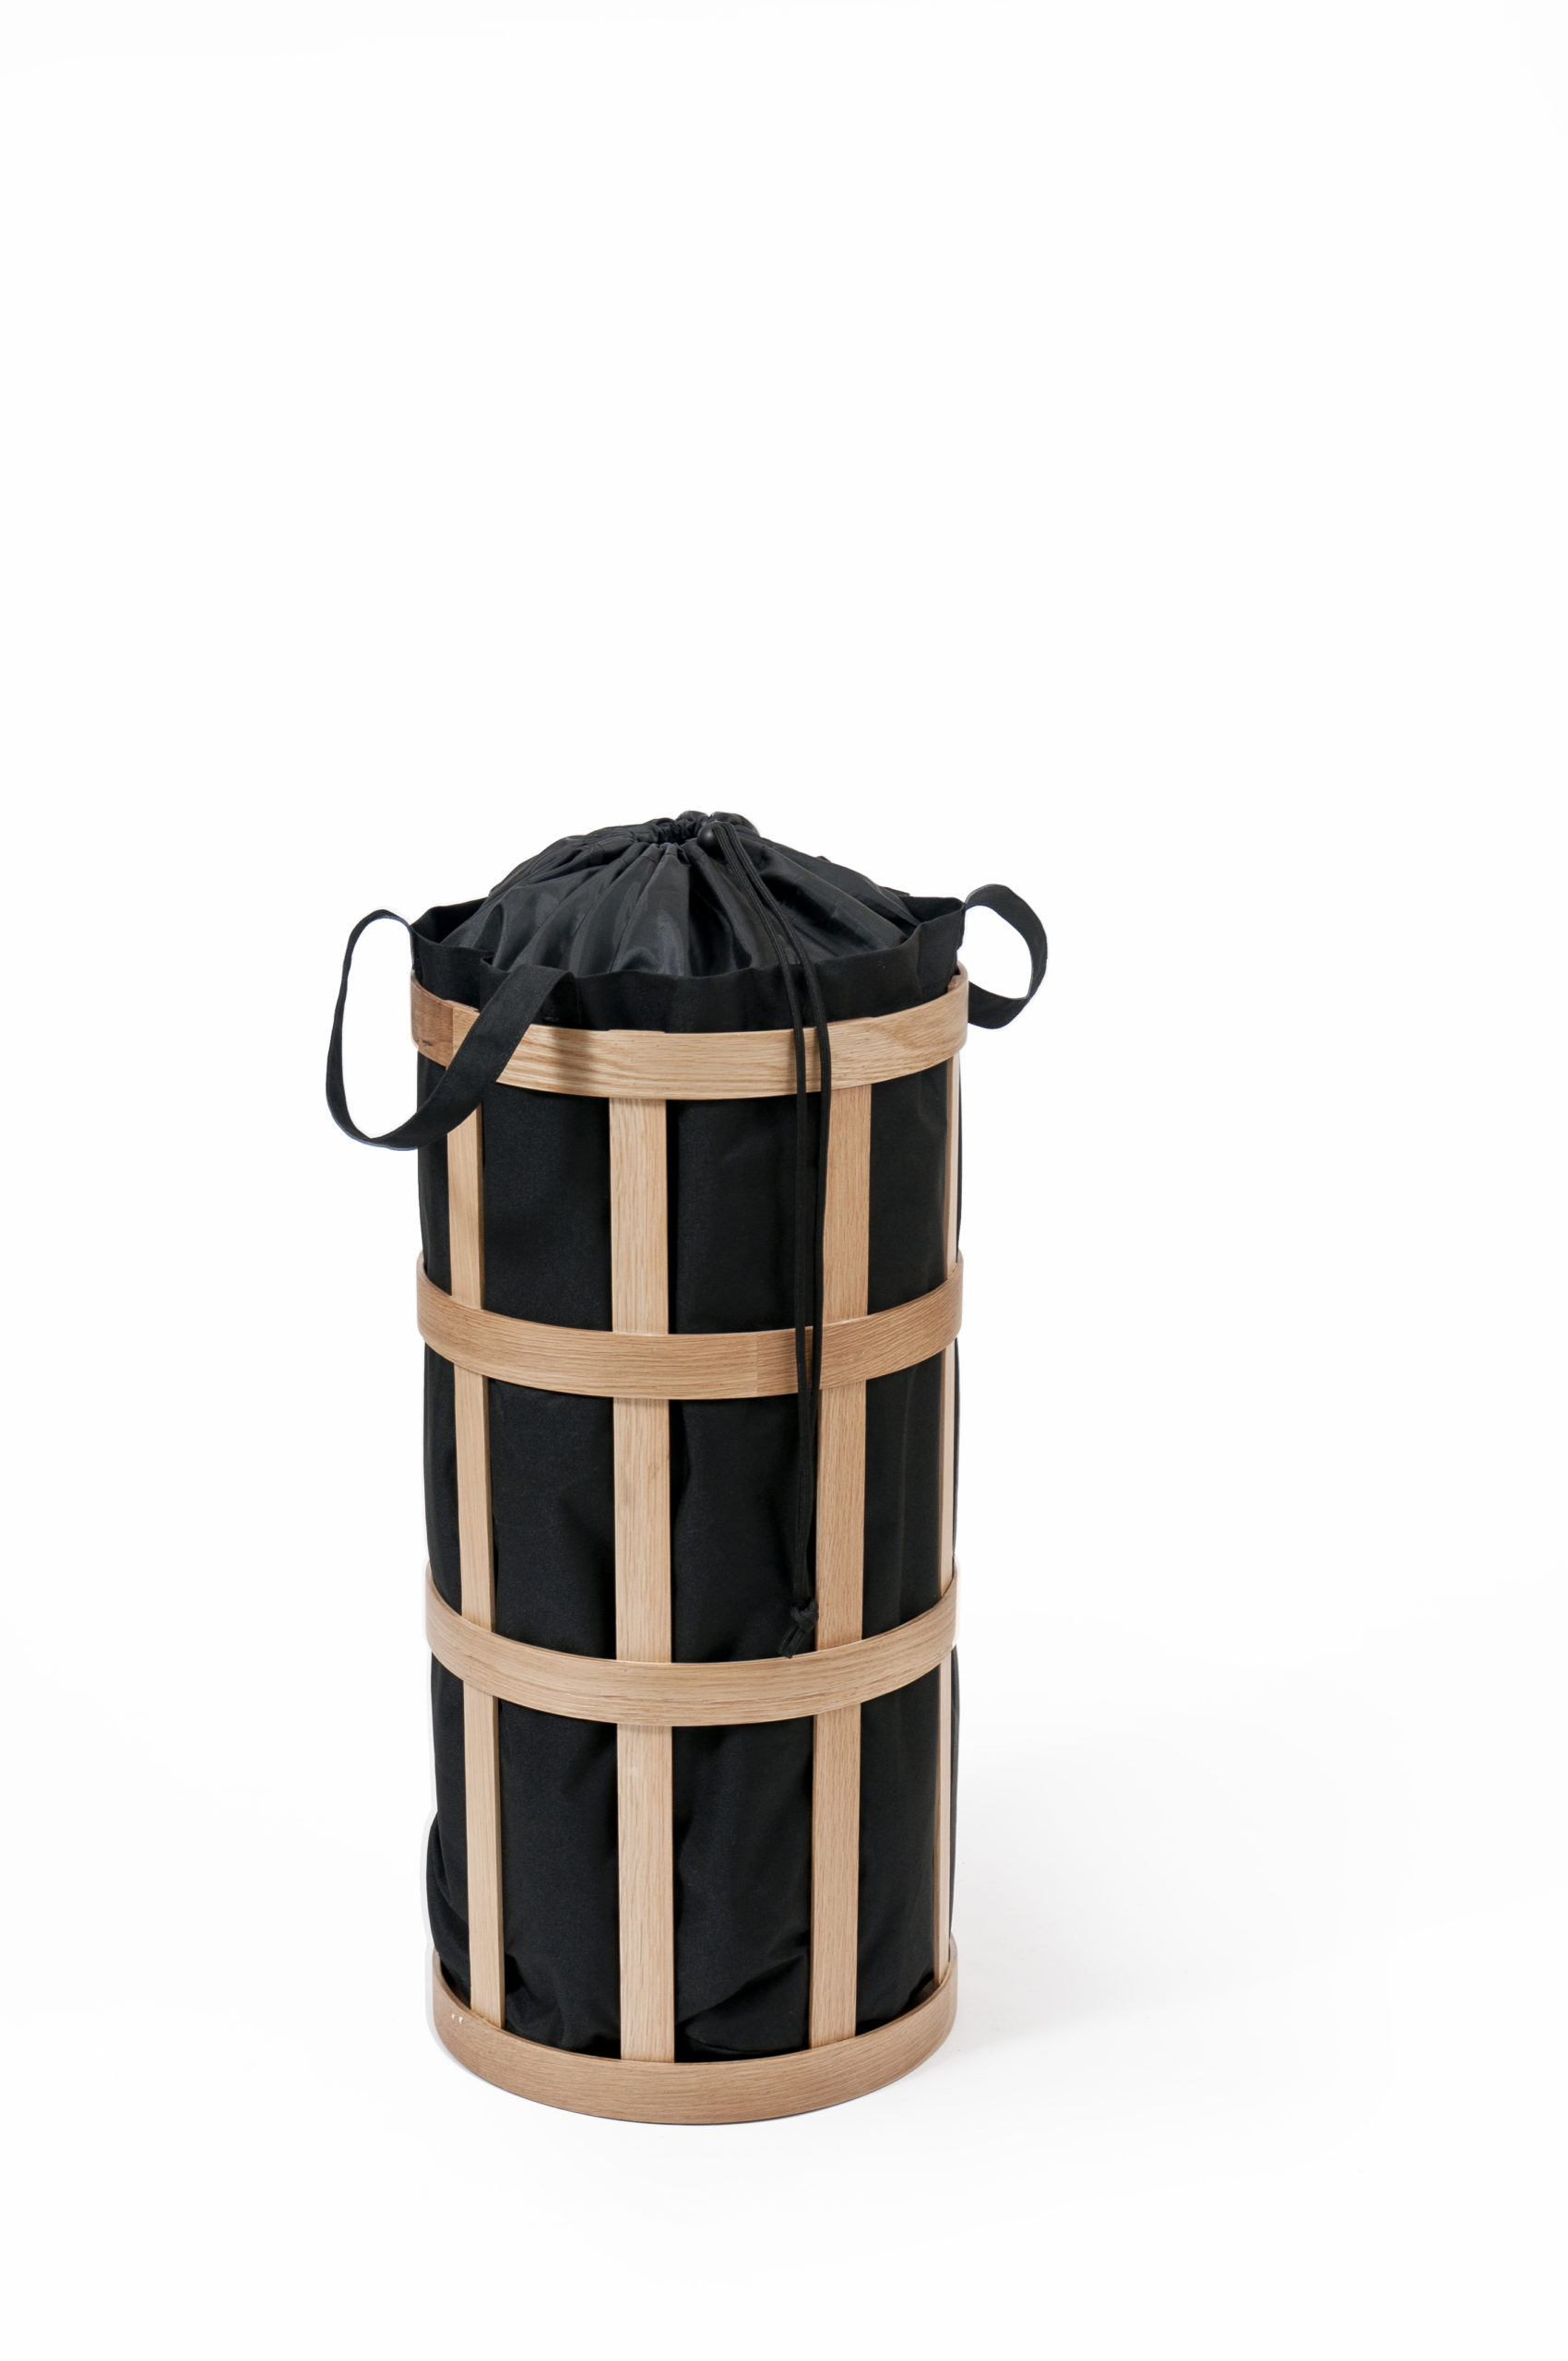 Laundry basket, £134, Lime Lace